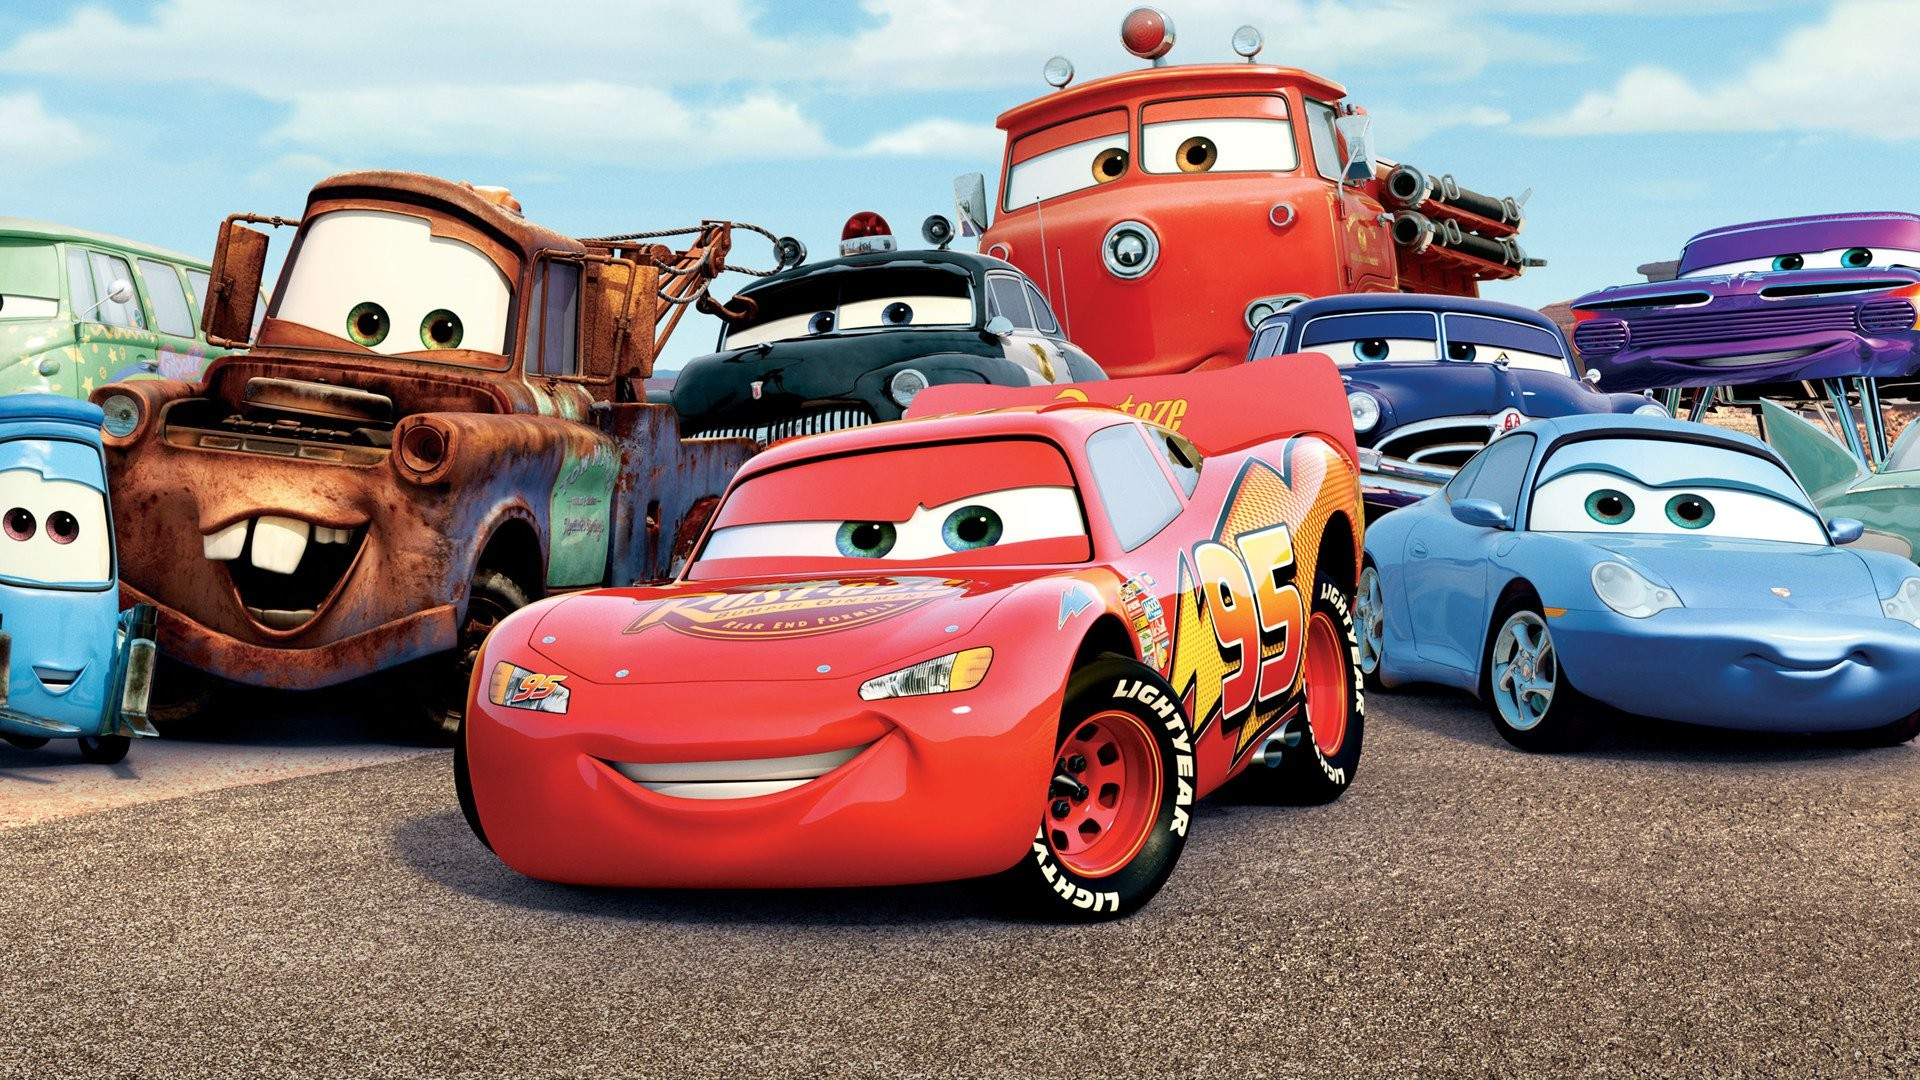 Cars Car Mater Lightning Mcqueen Sally Carrera Flo Cars Movie Wallpaper Hd 1920x1080 Download Hd Wallpaper Wallpapertip